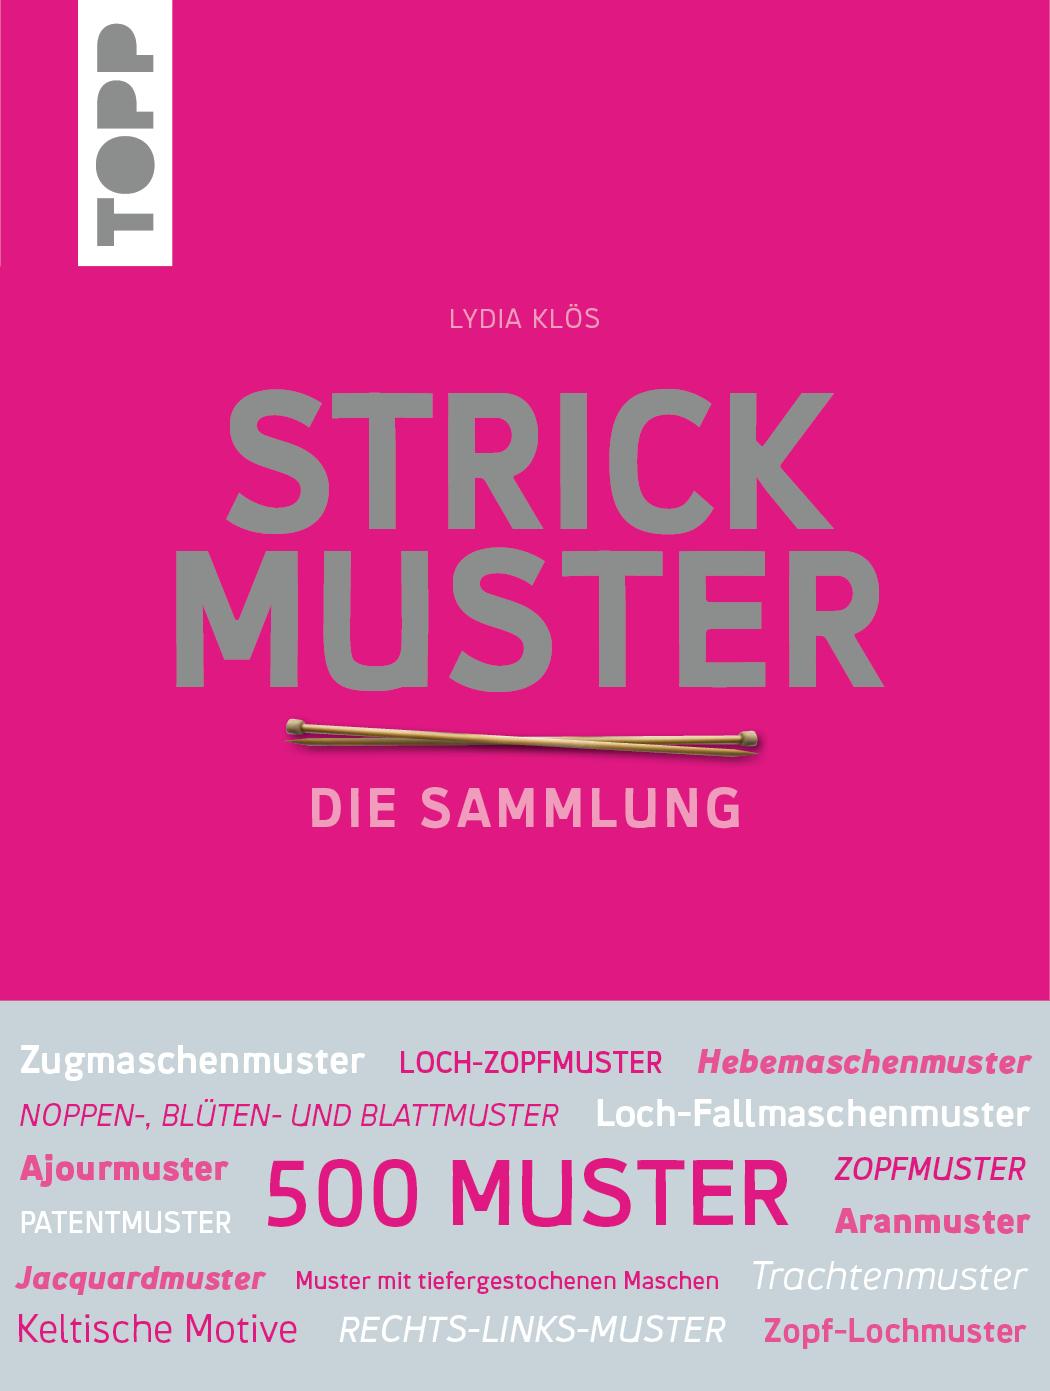 Strickmuster- Die Sammlung TOPP 6480   Martinas Bastel- & Hobbykiste